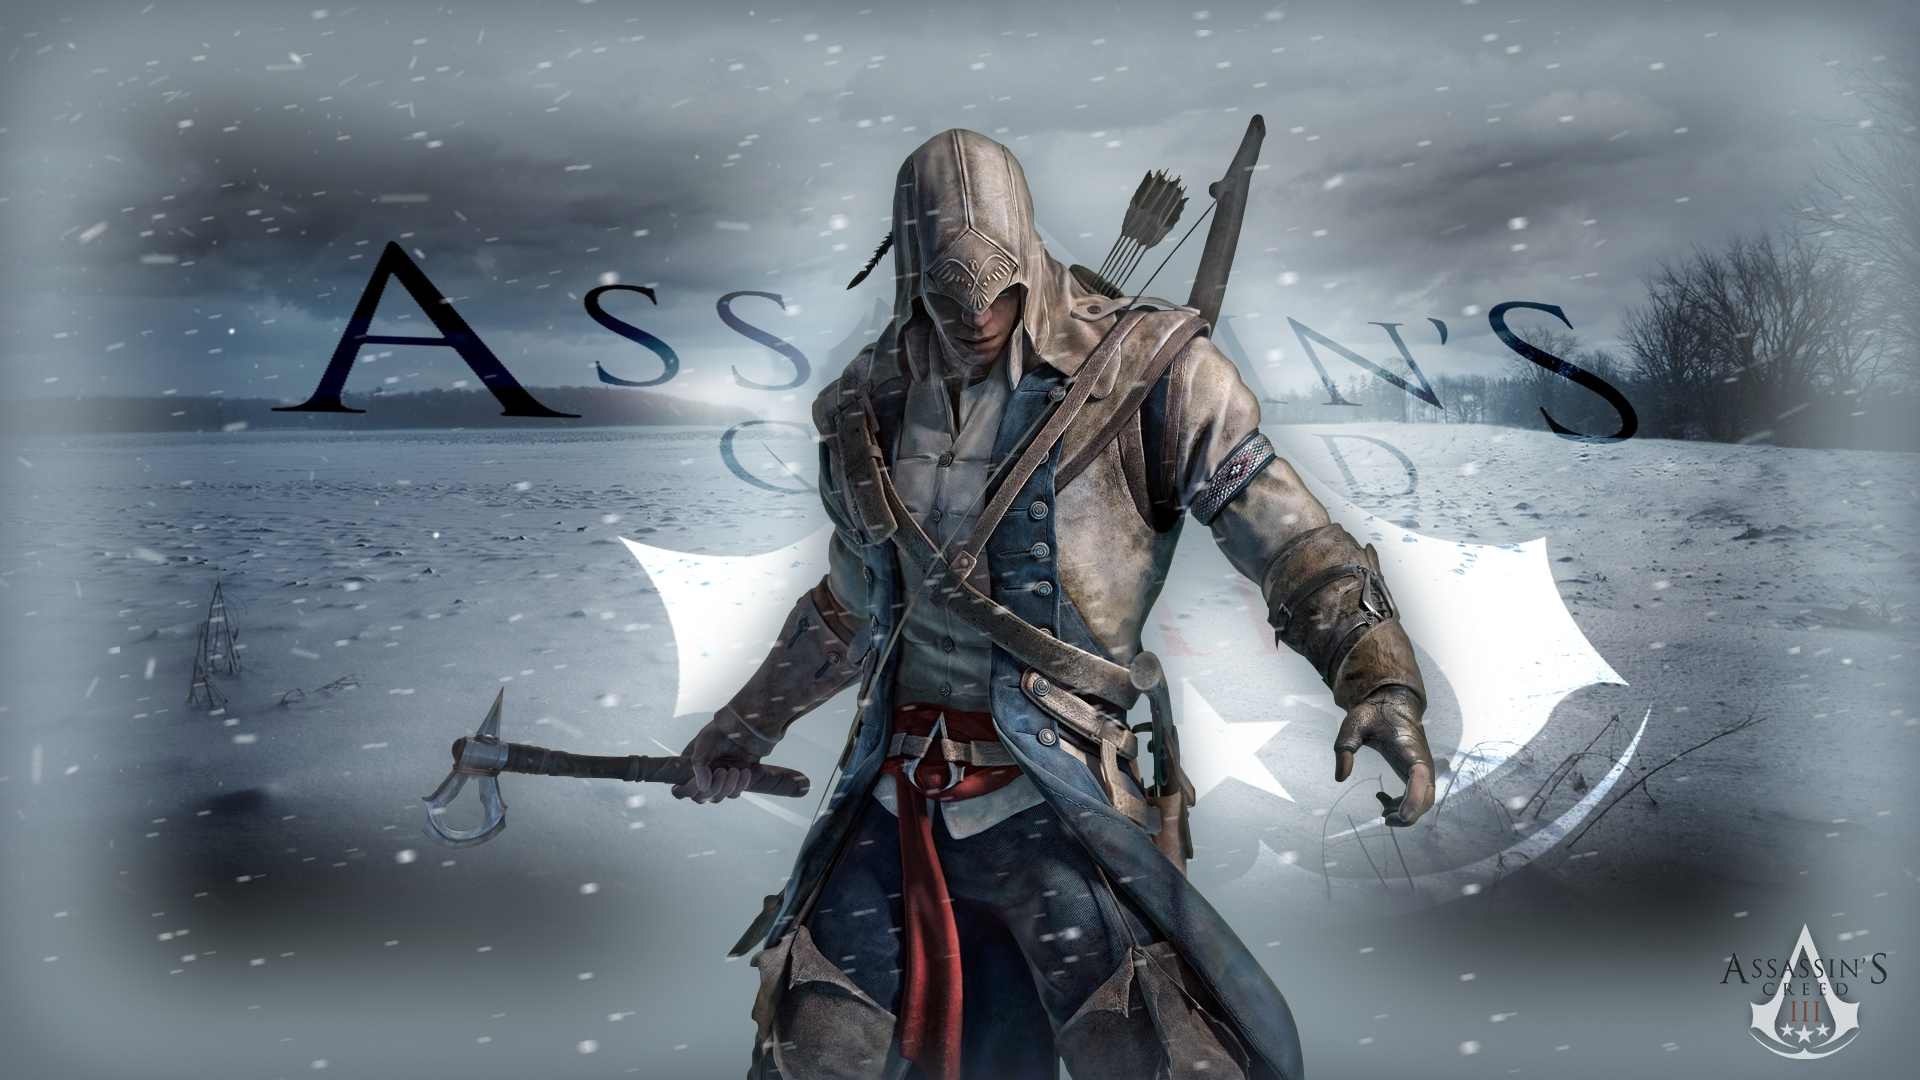 aleksander assassins creed iii - HD1400×1050